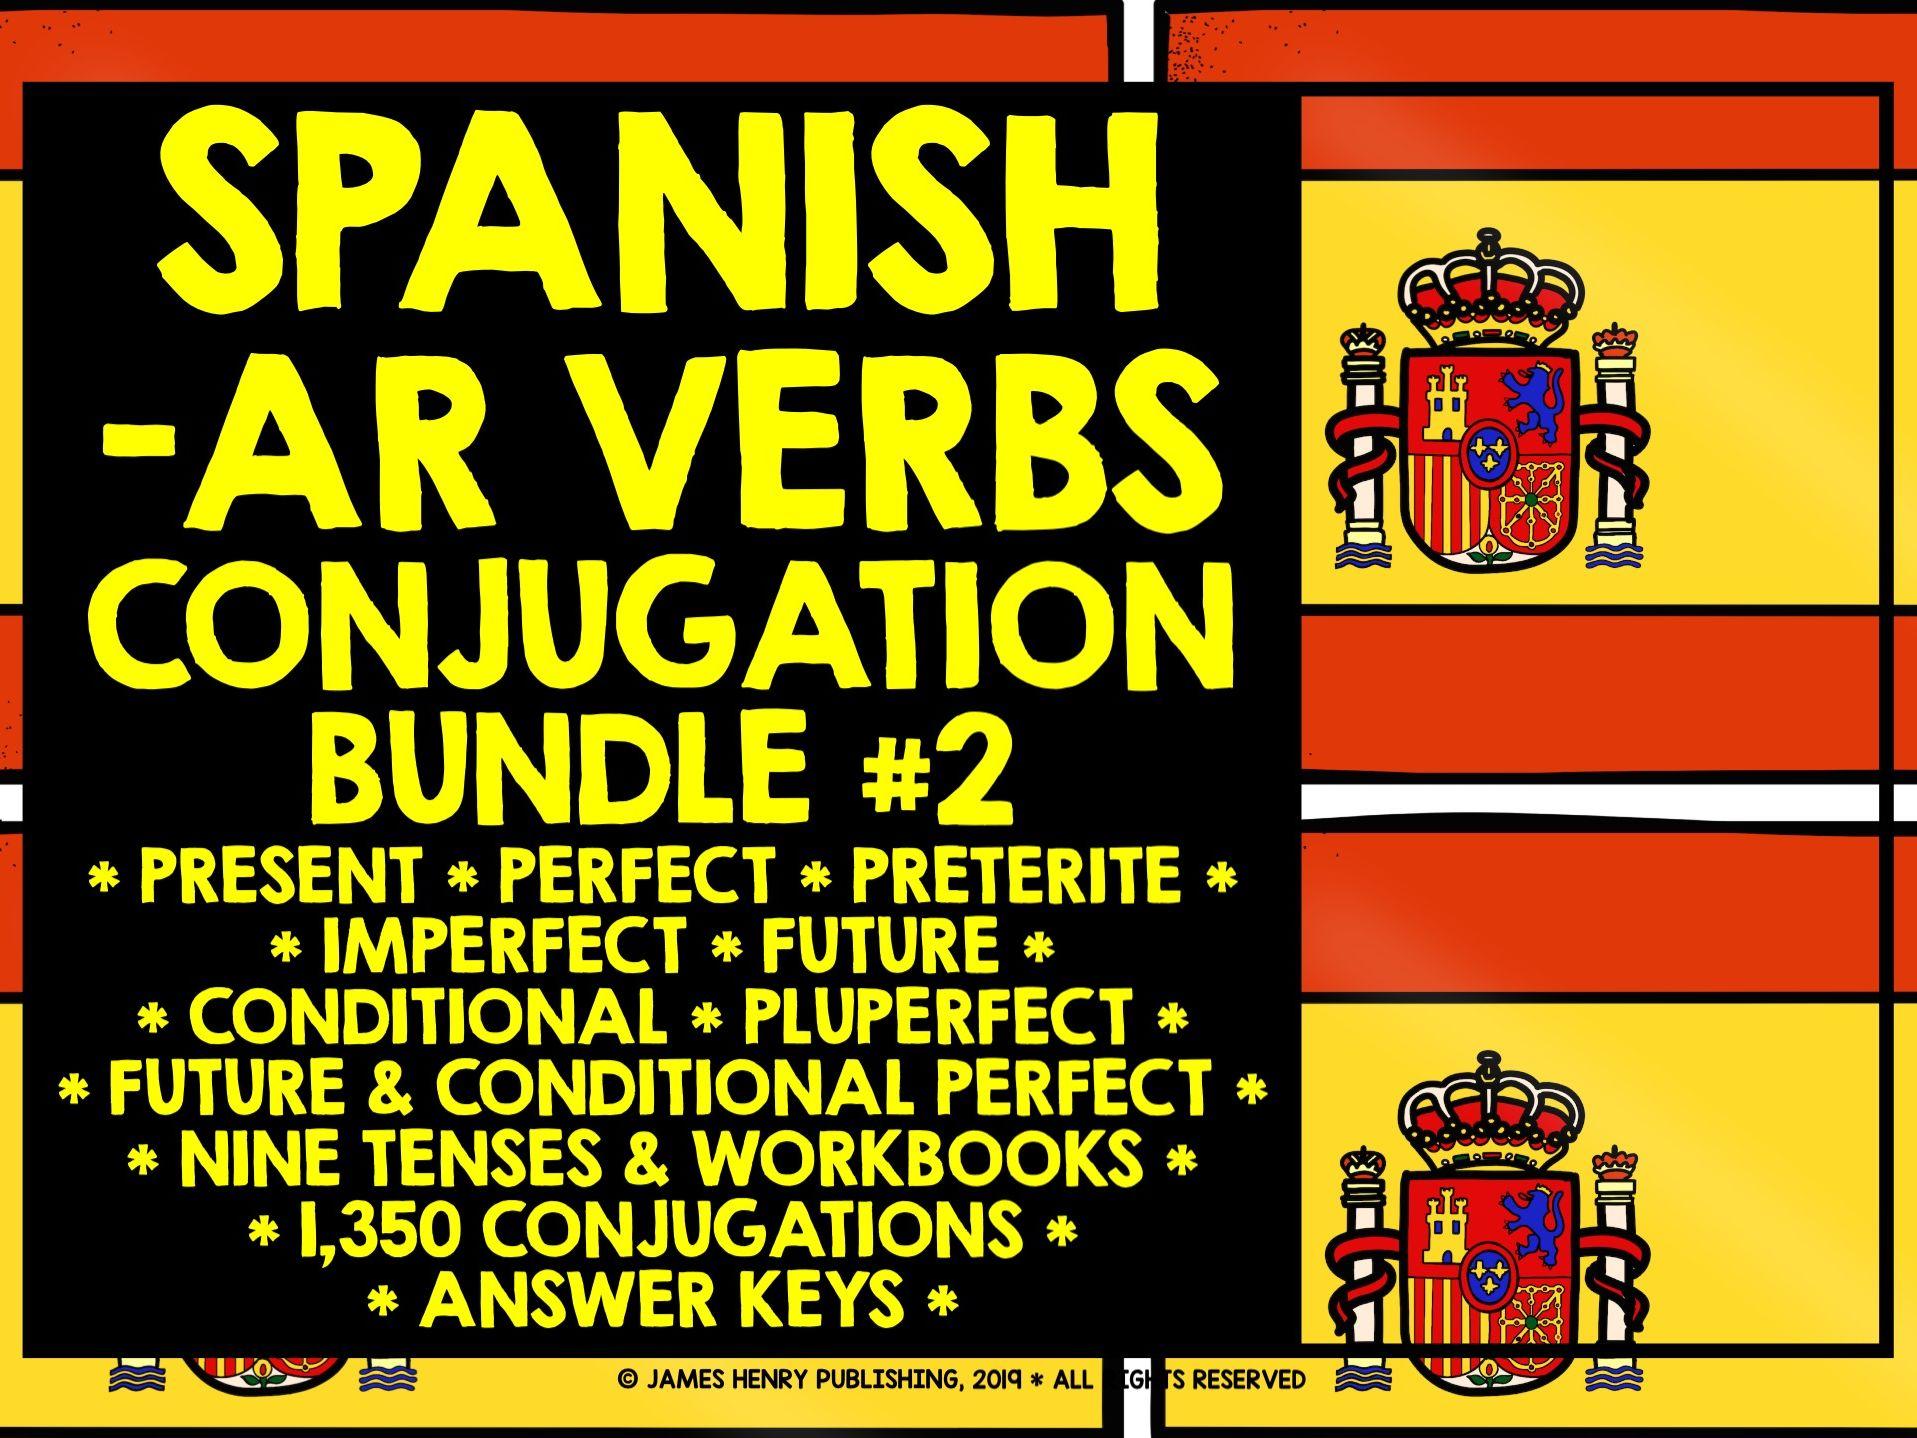 SPANISH -AR VERBS CONJUGATION BUNDLE #2